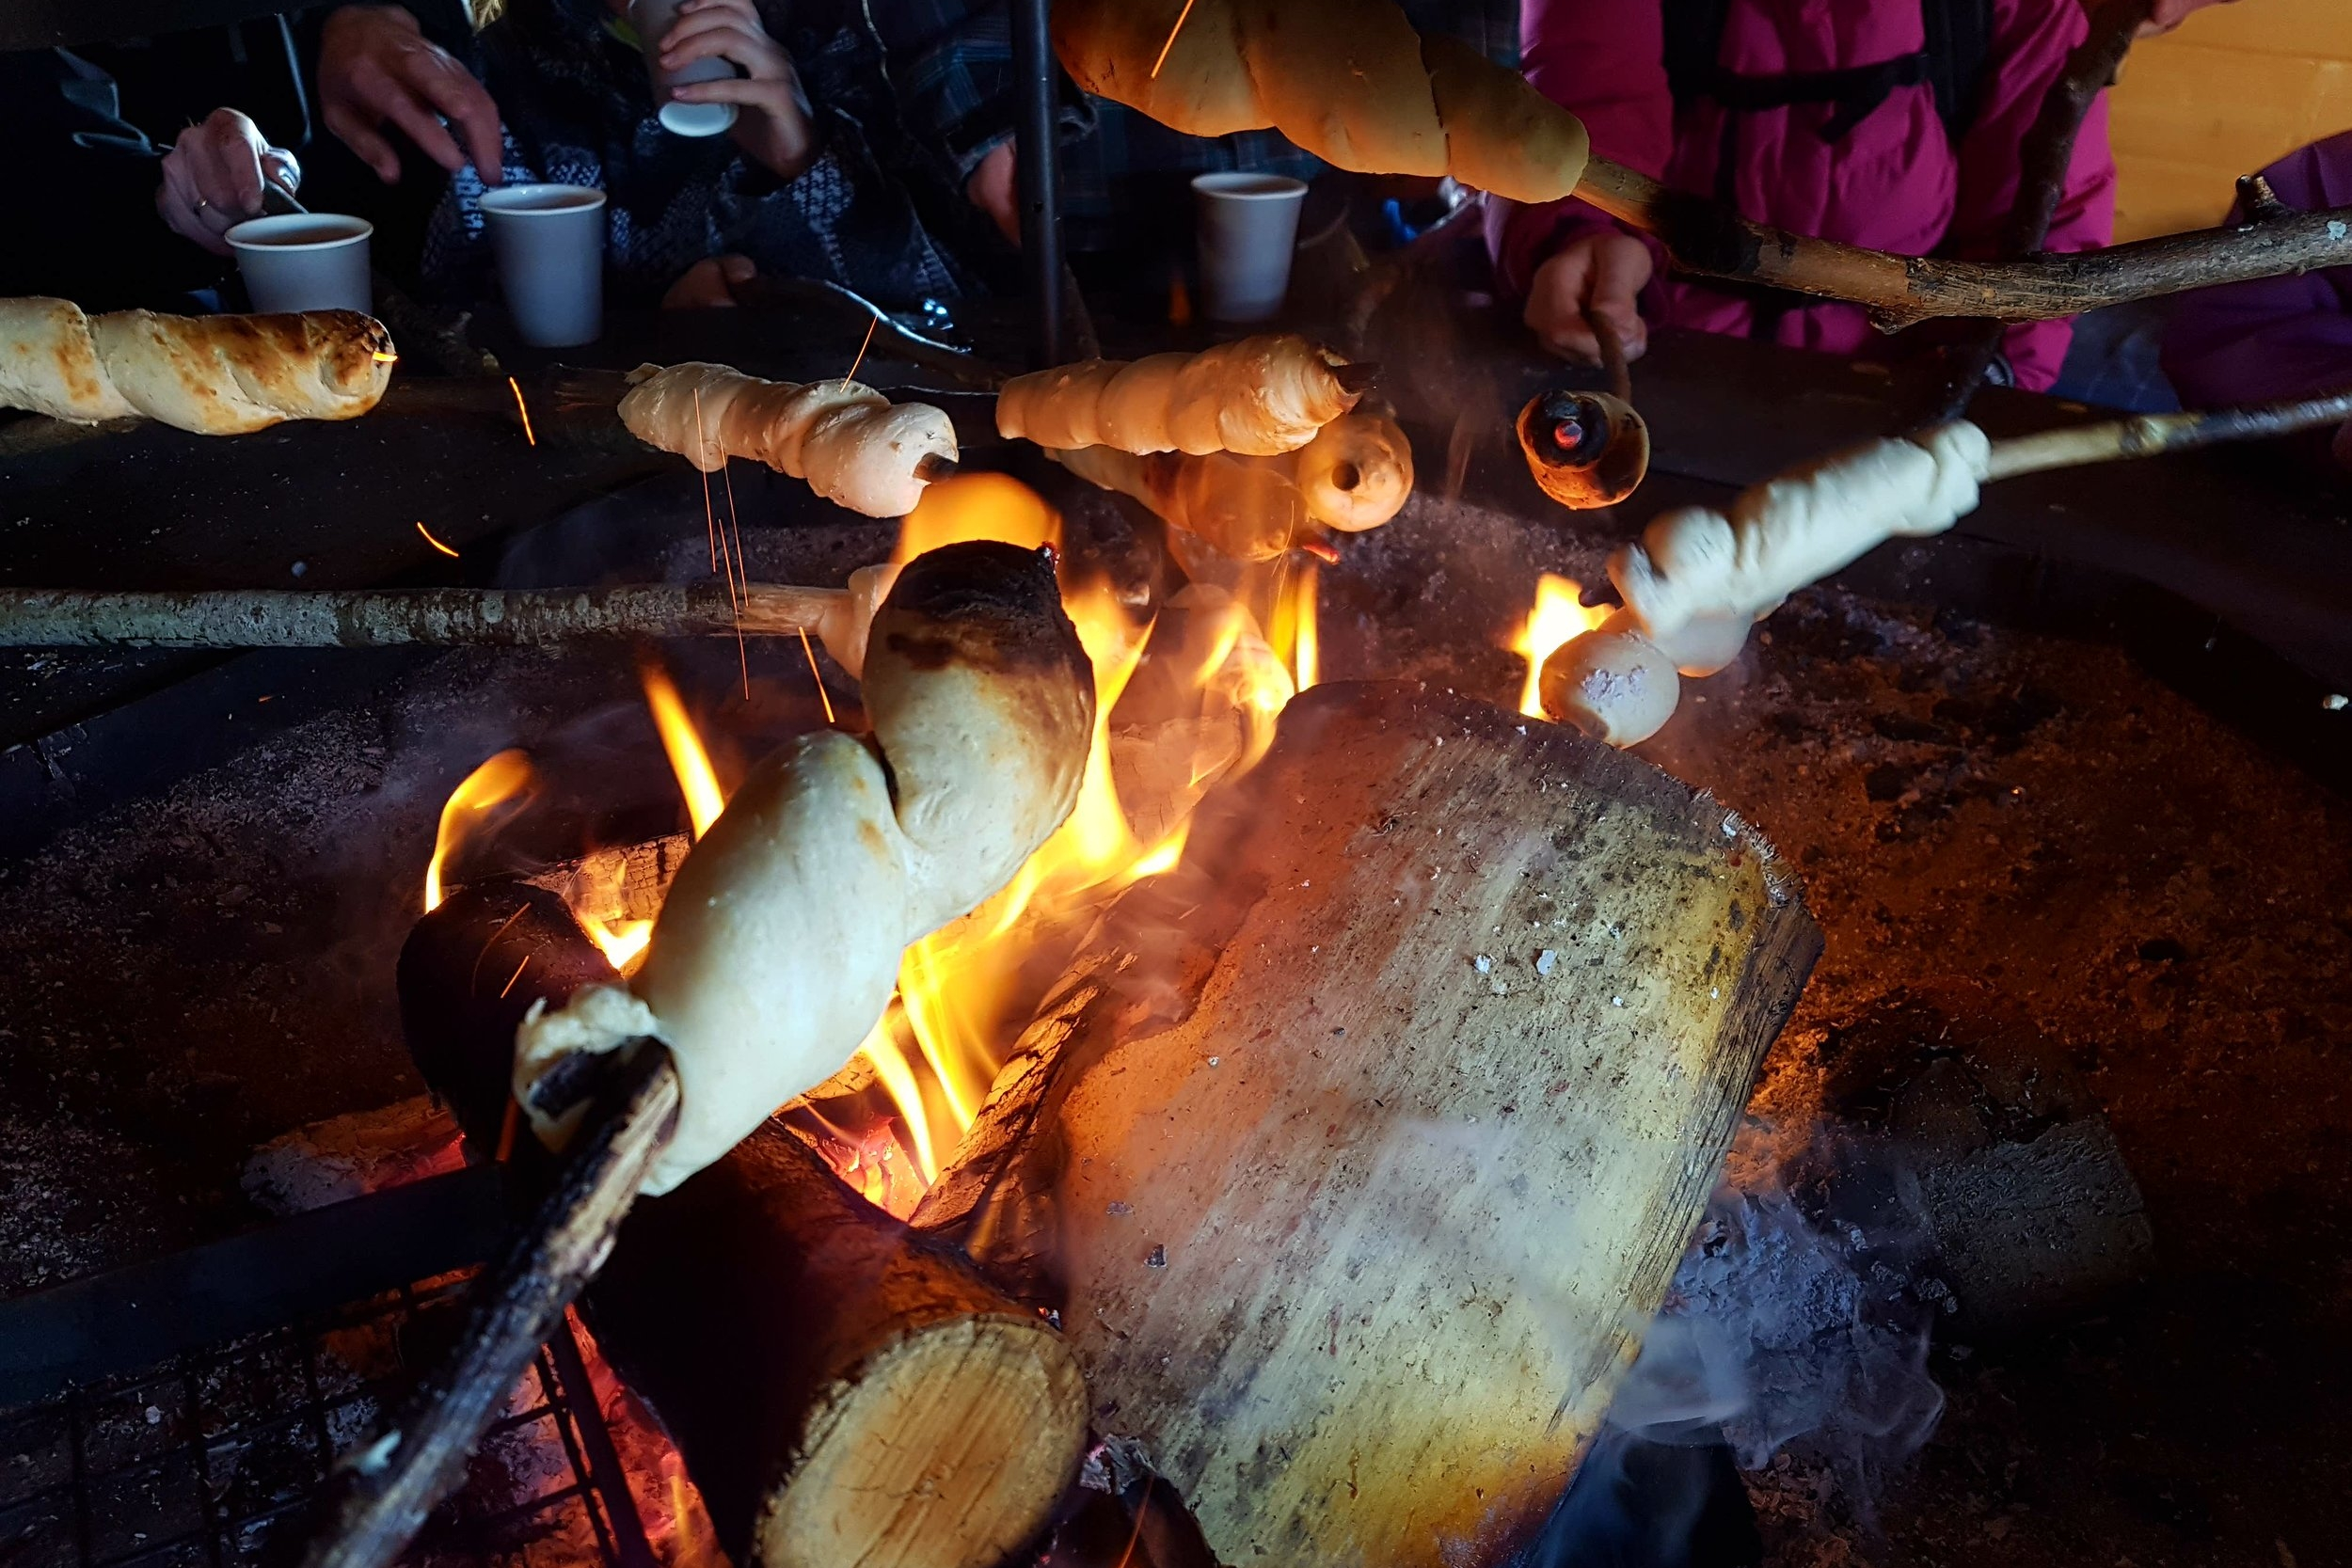 Bread twists around the fire - always a cozy time